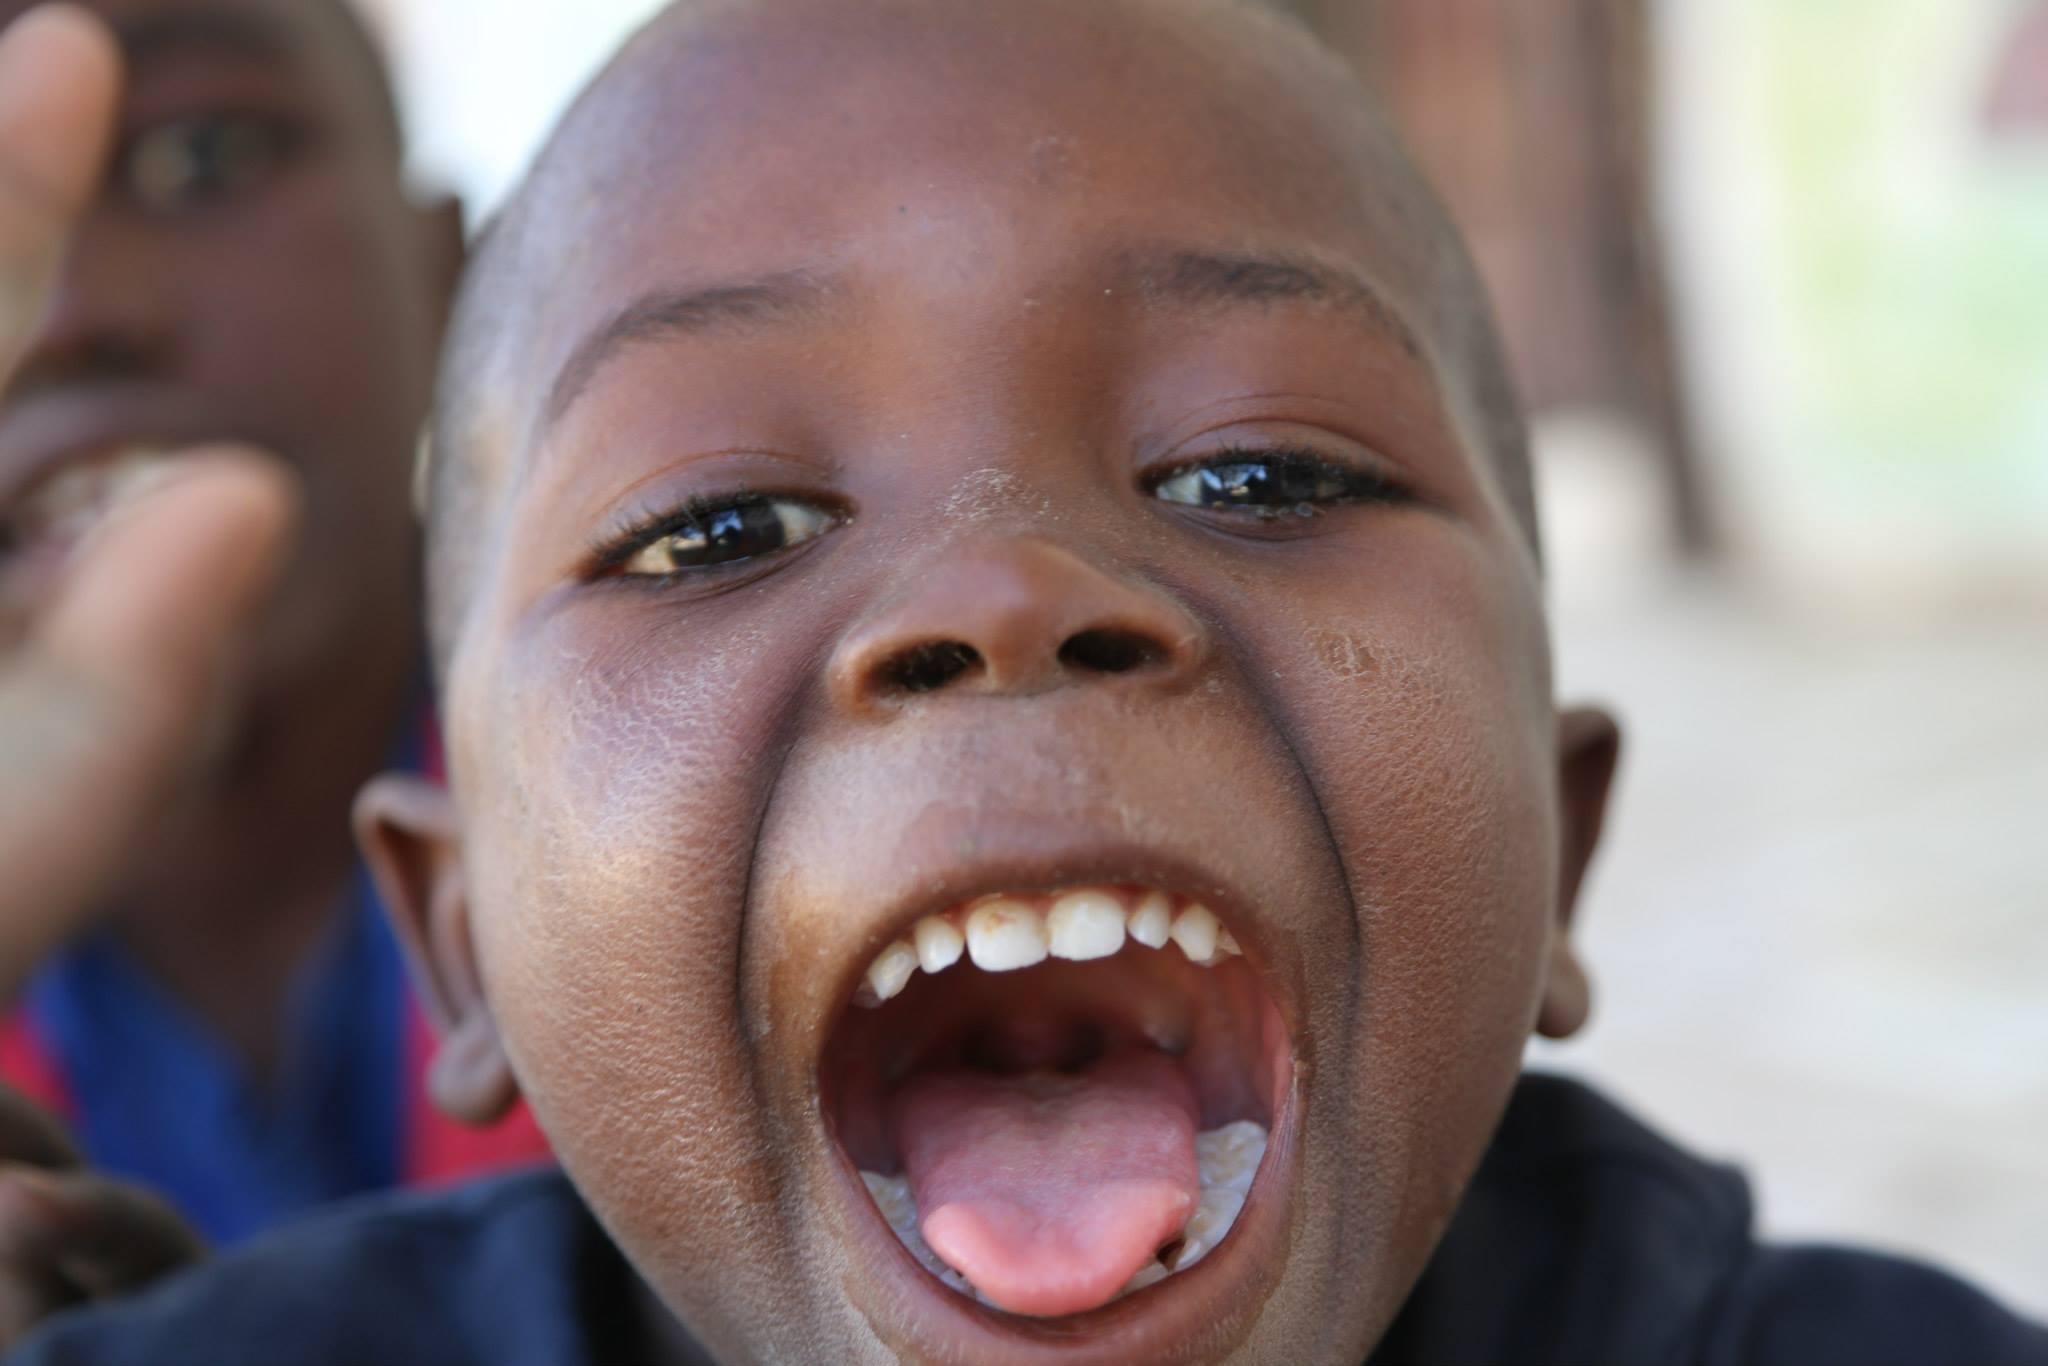 black boy, zambian boy, boy in zambia, mouth open, mouth agape, toy box studios, zambia 2018